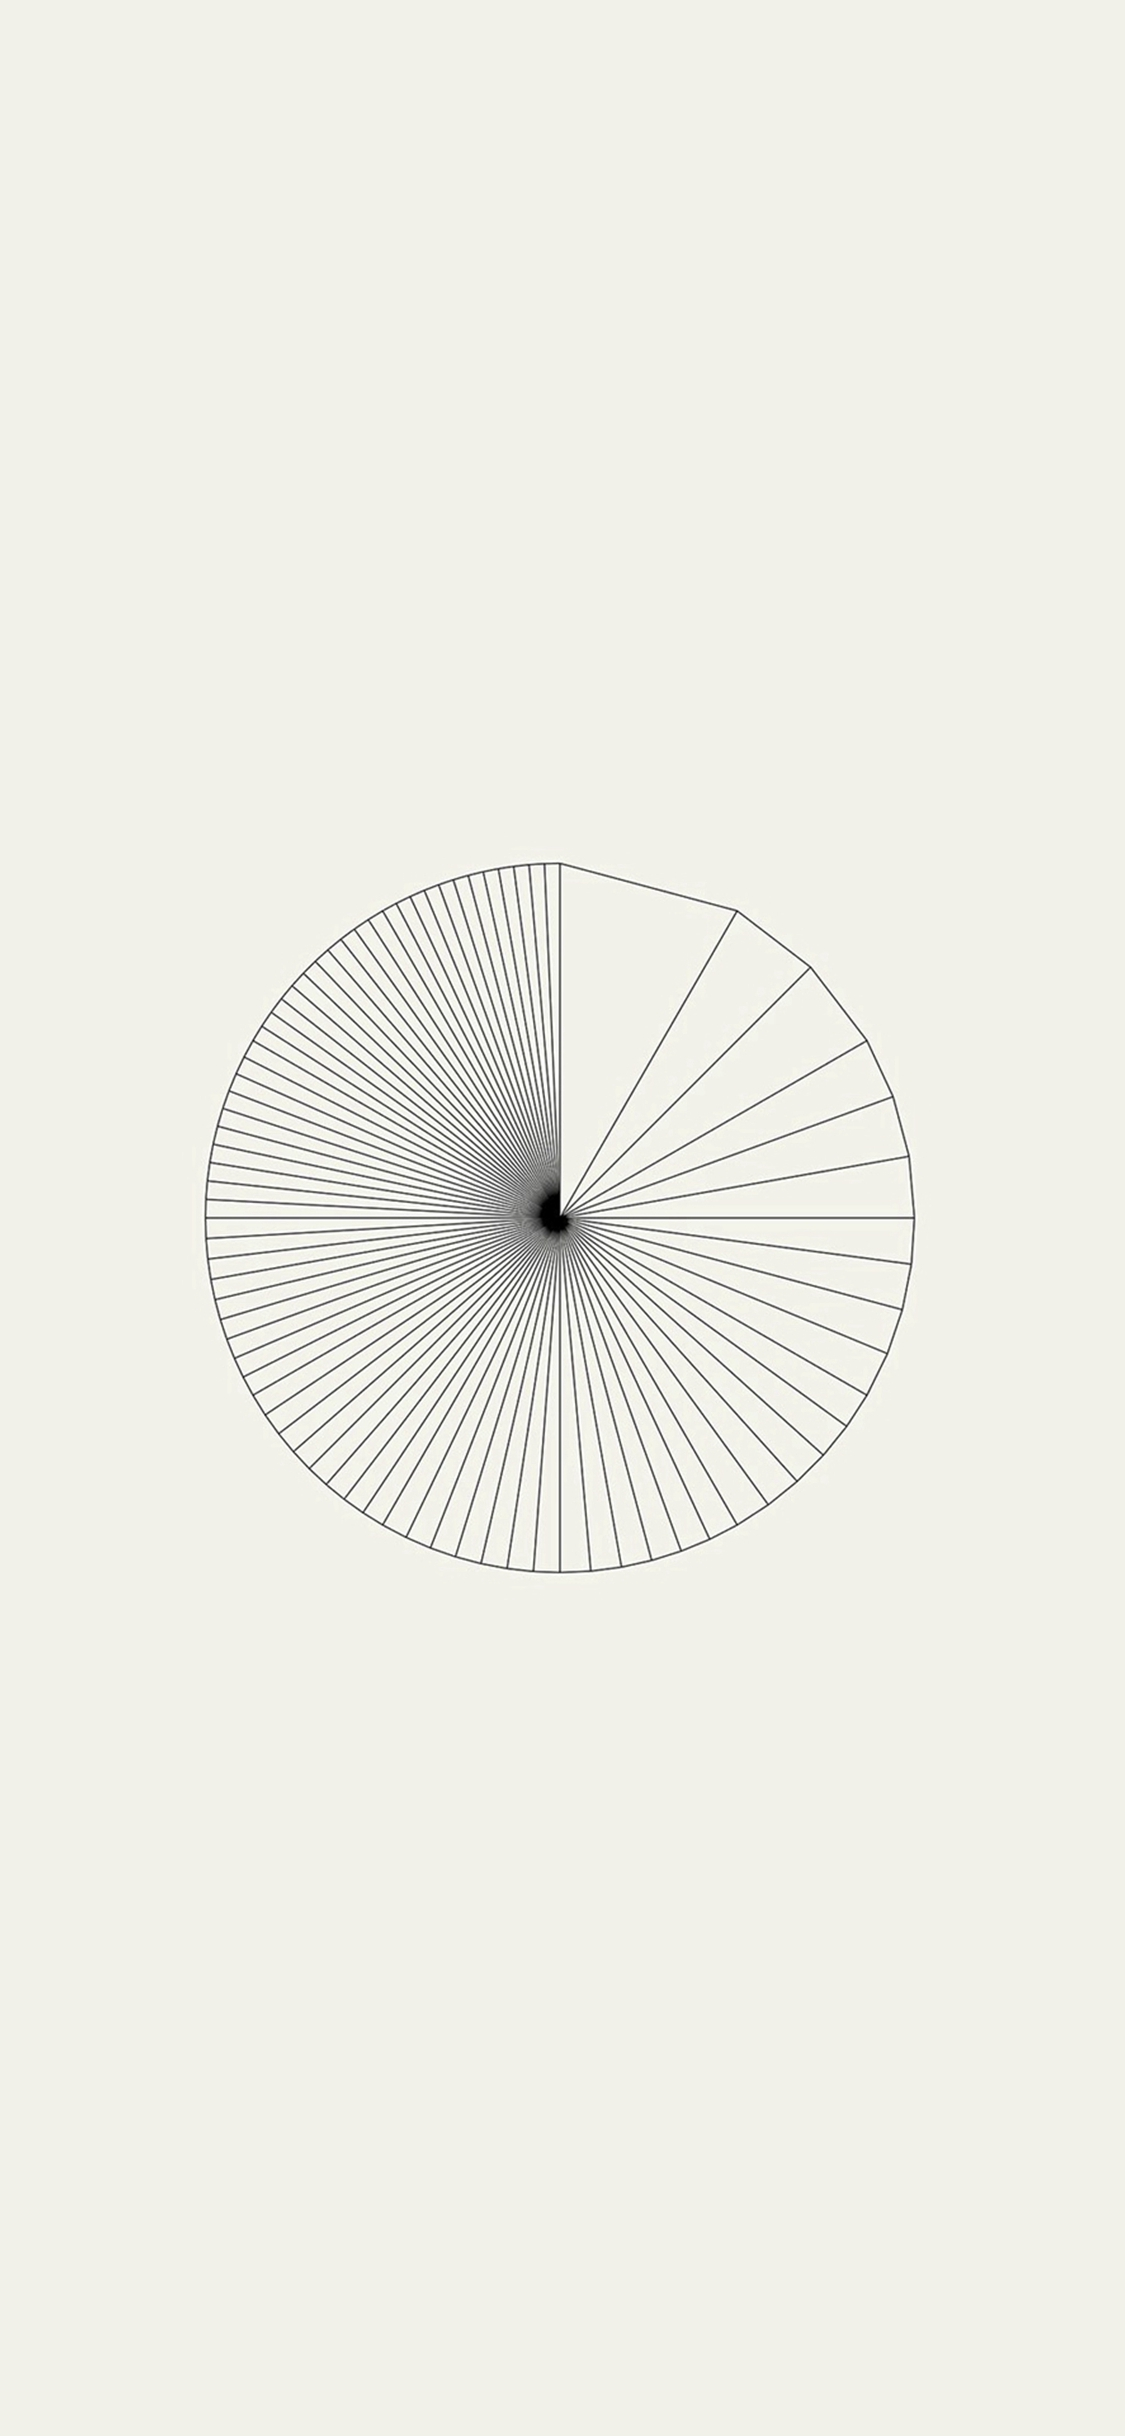 Slides Minimal Art Simple Iphone X Wallpaper Download Iphone